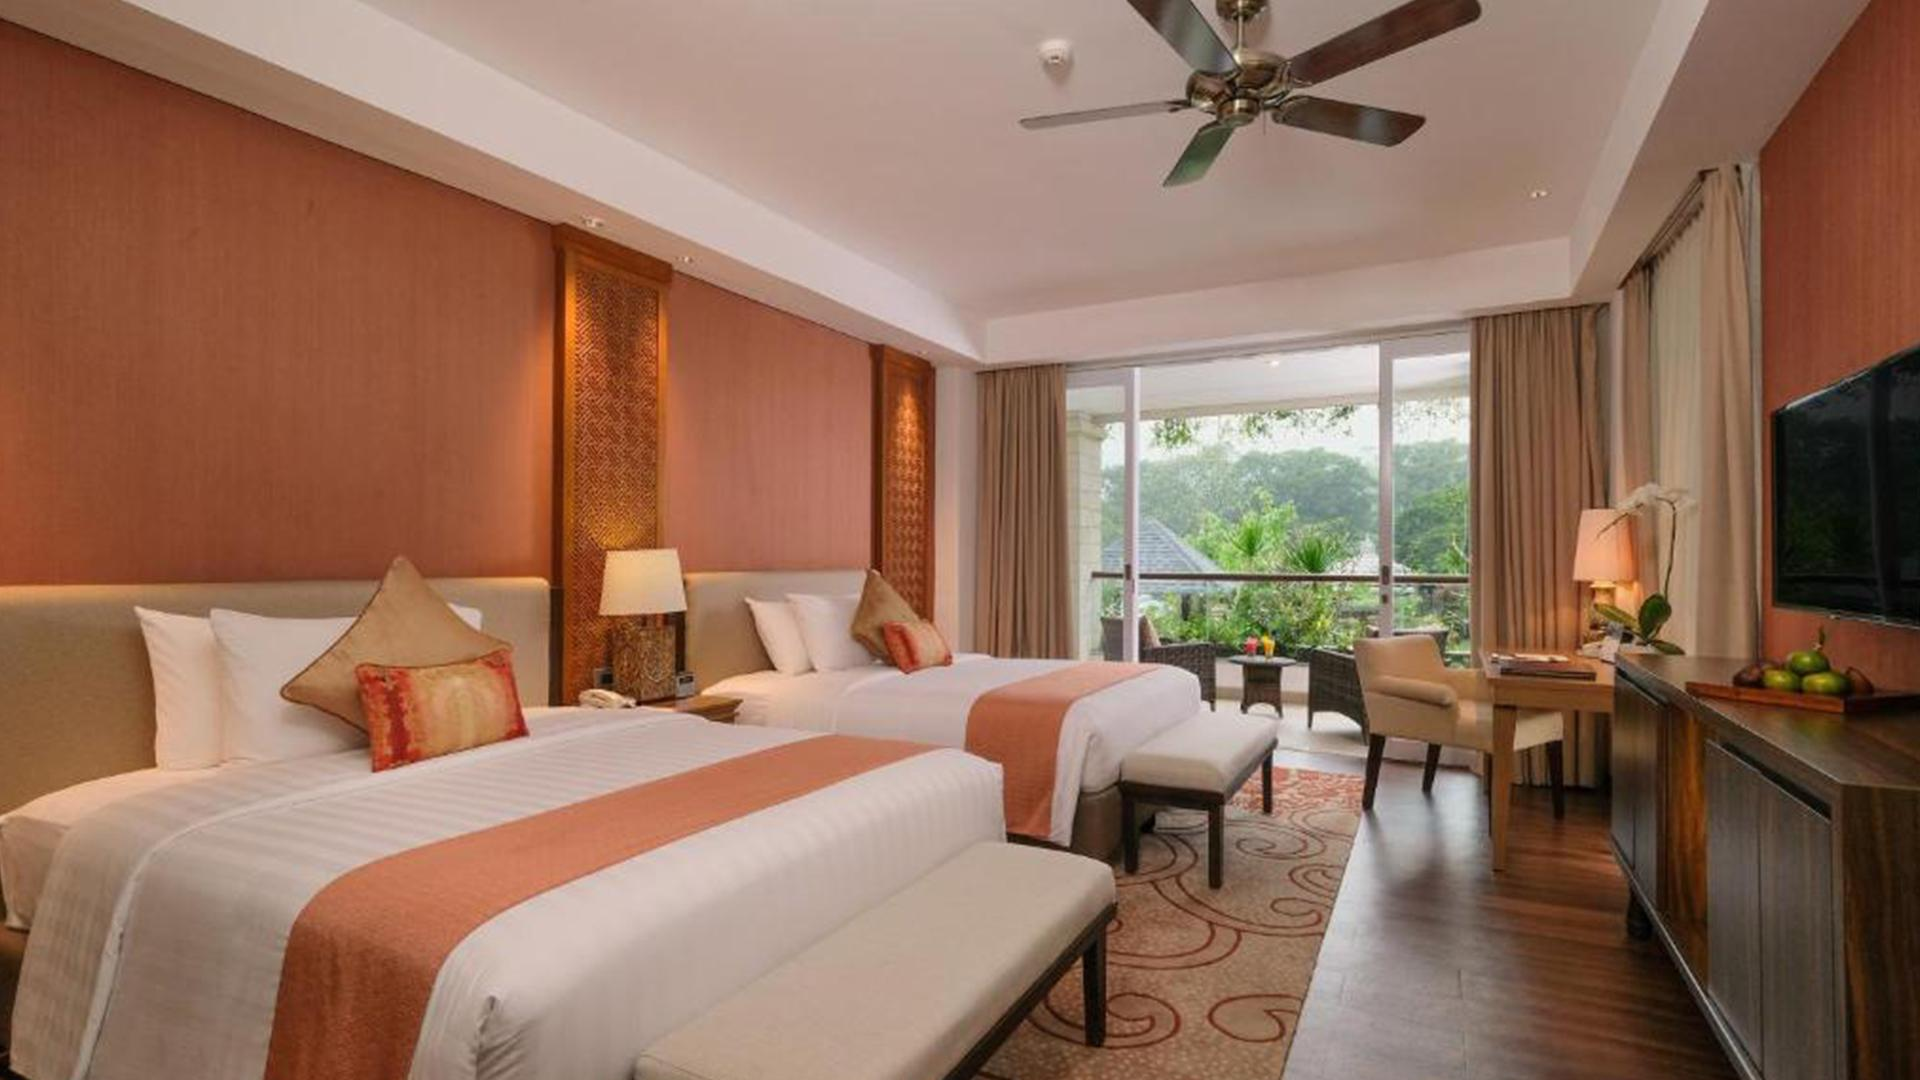 Deluxe Family Room image 1 at Saranam Resort & Spa* by Kabupaten Tabanan, Bali, Indonesia